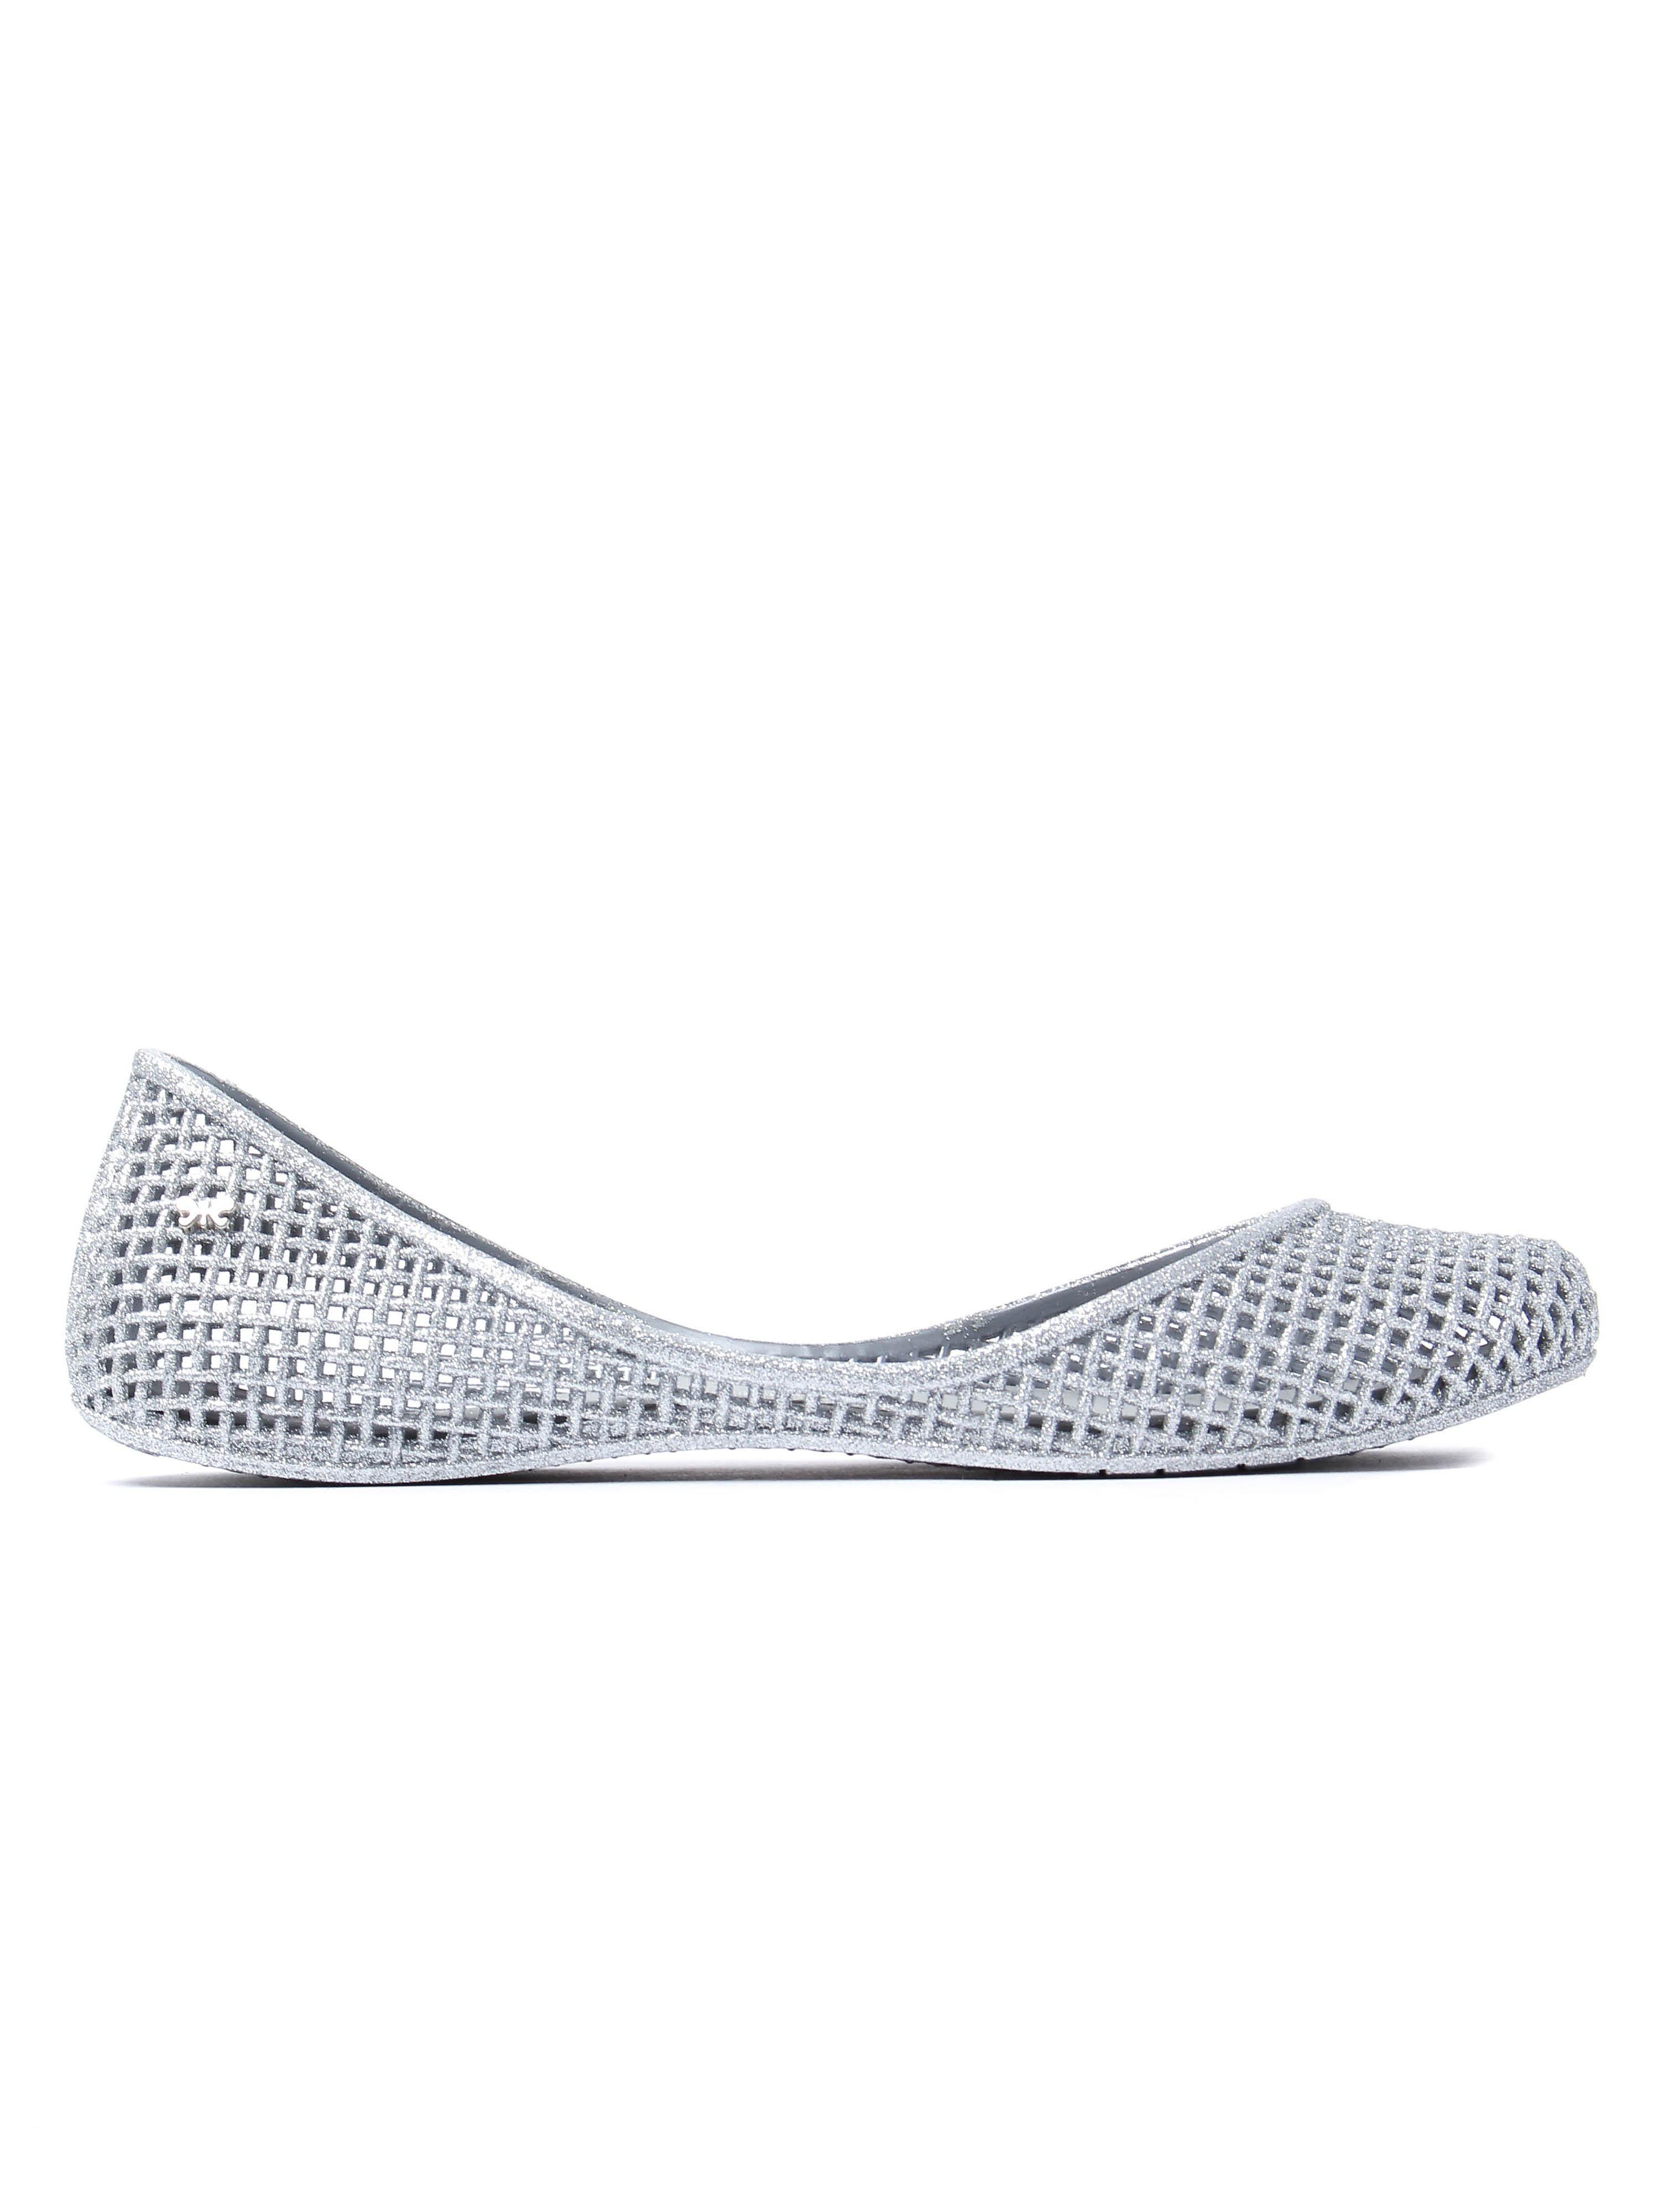 Zaxy Women's Amora Glitter Ballerina Pumps - Silver